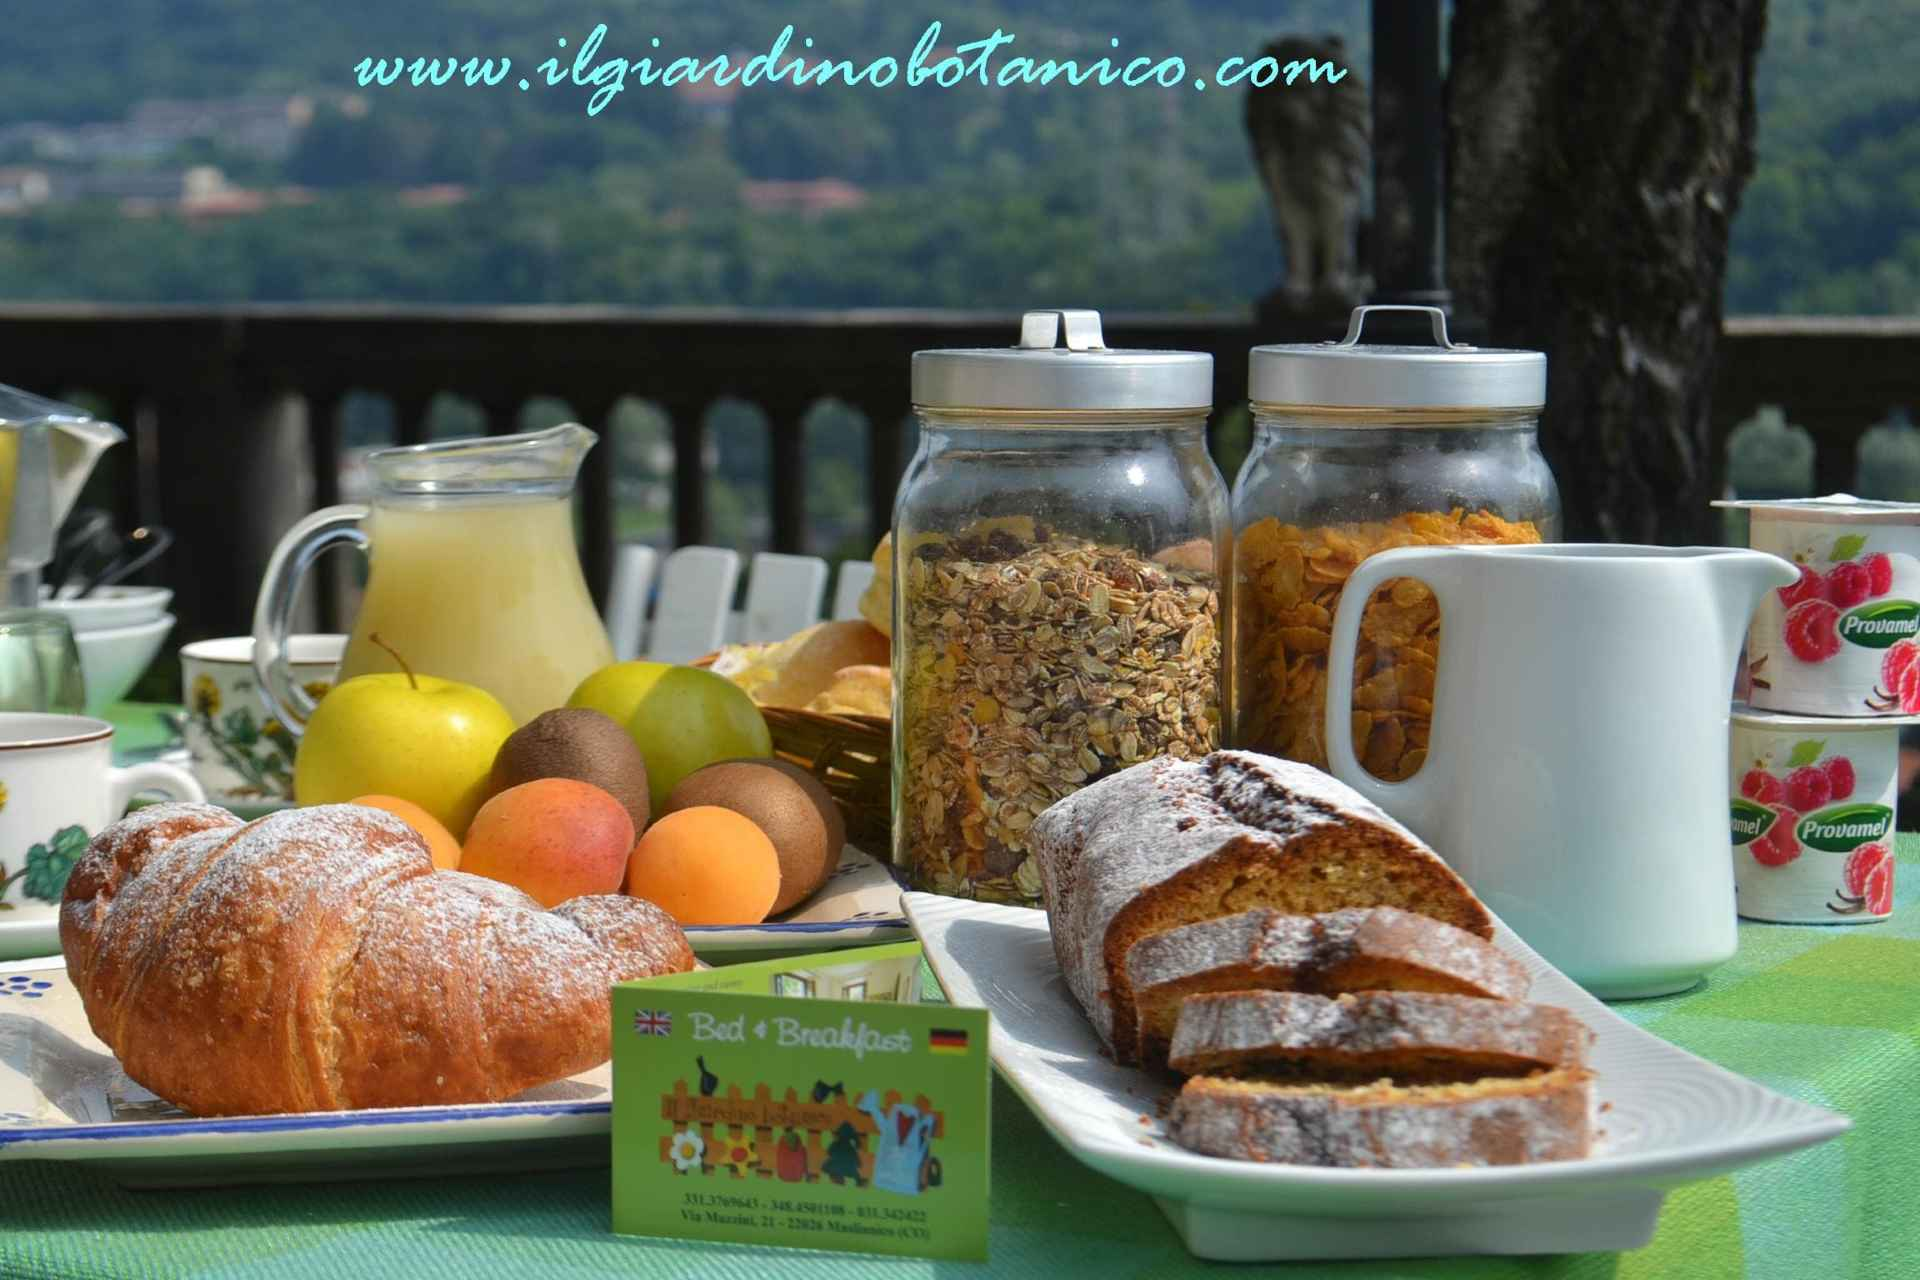 bed-breakfast-il-giardino-botanico